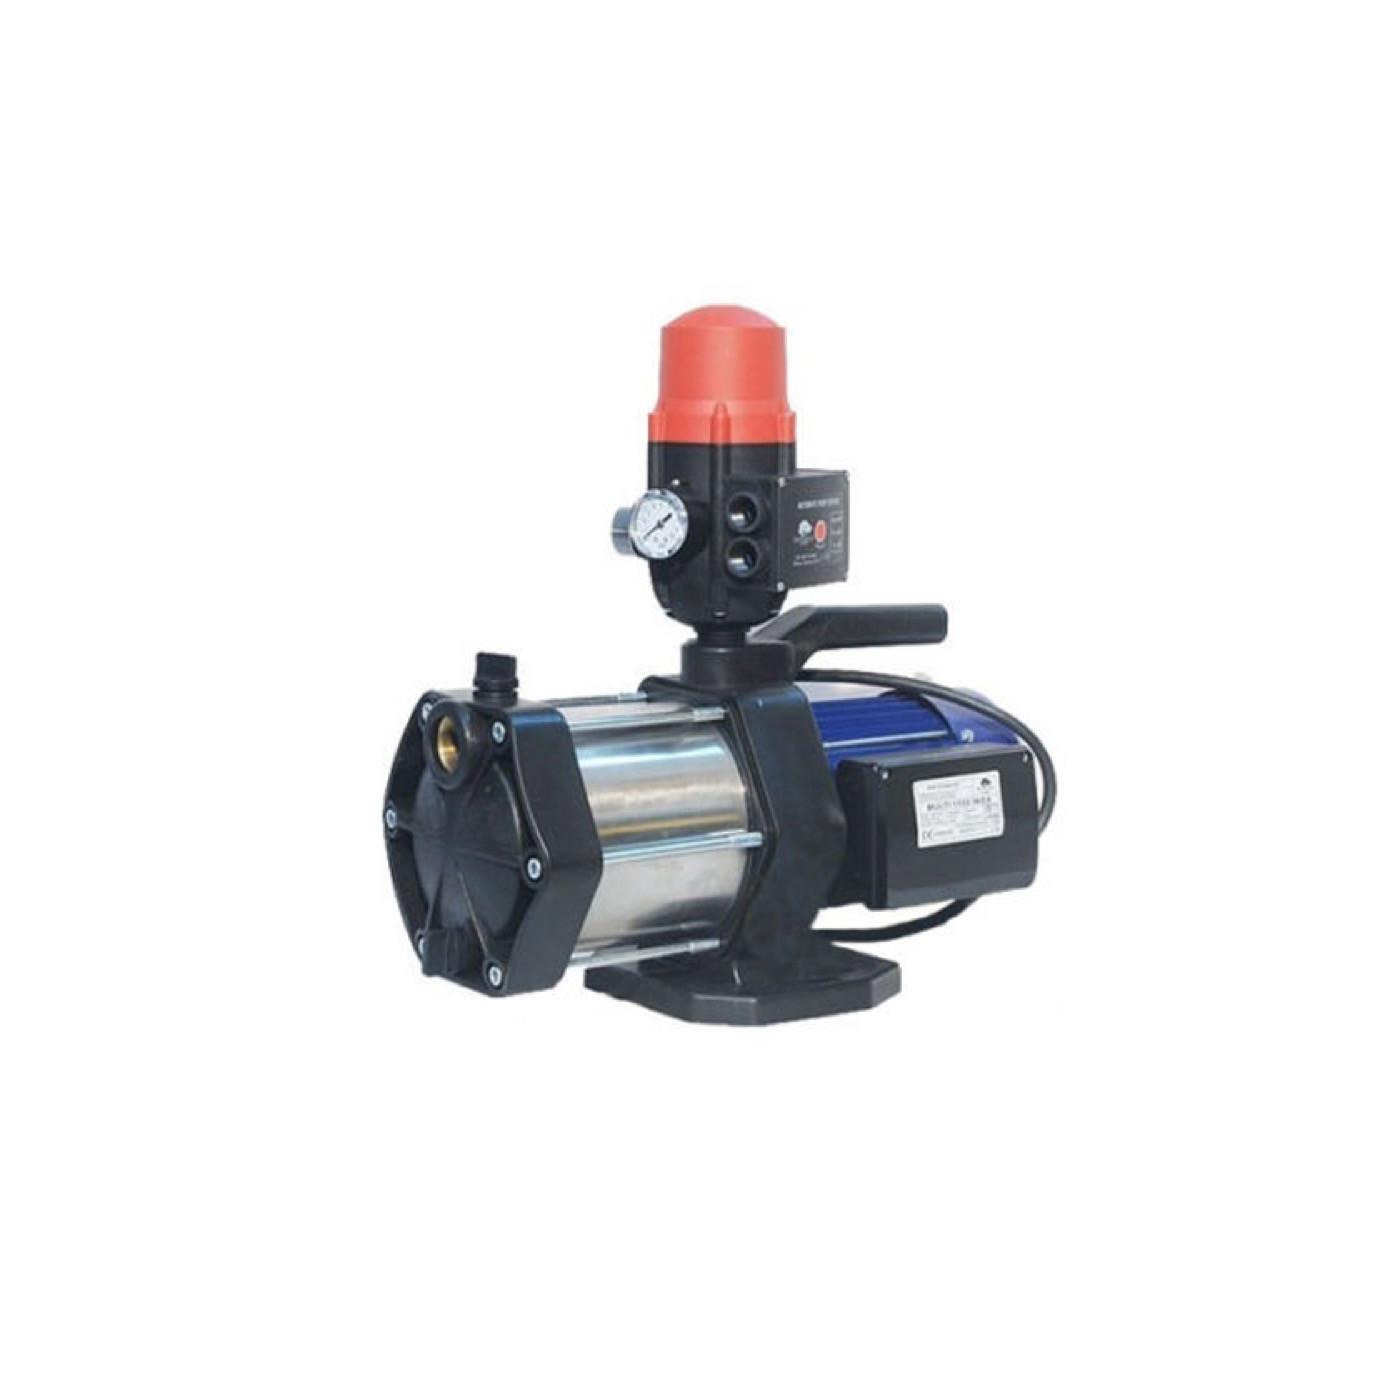 Wasserpumpe 1100W 90l/min Jetpumpe Gartenpumpe Hauswasserwerk Kreiselpumpe  B